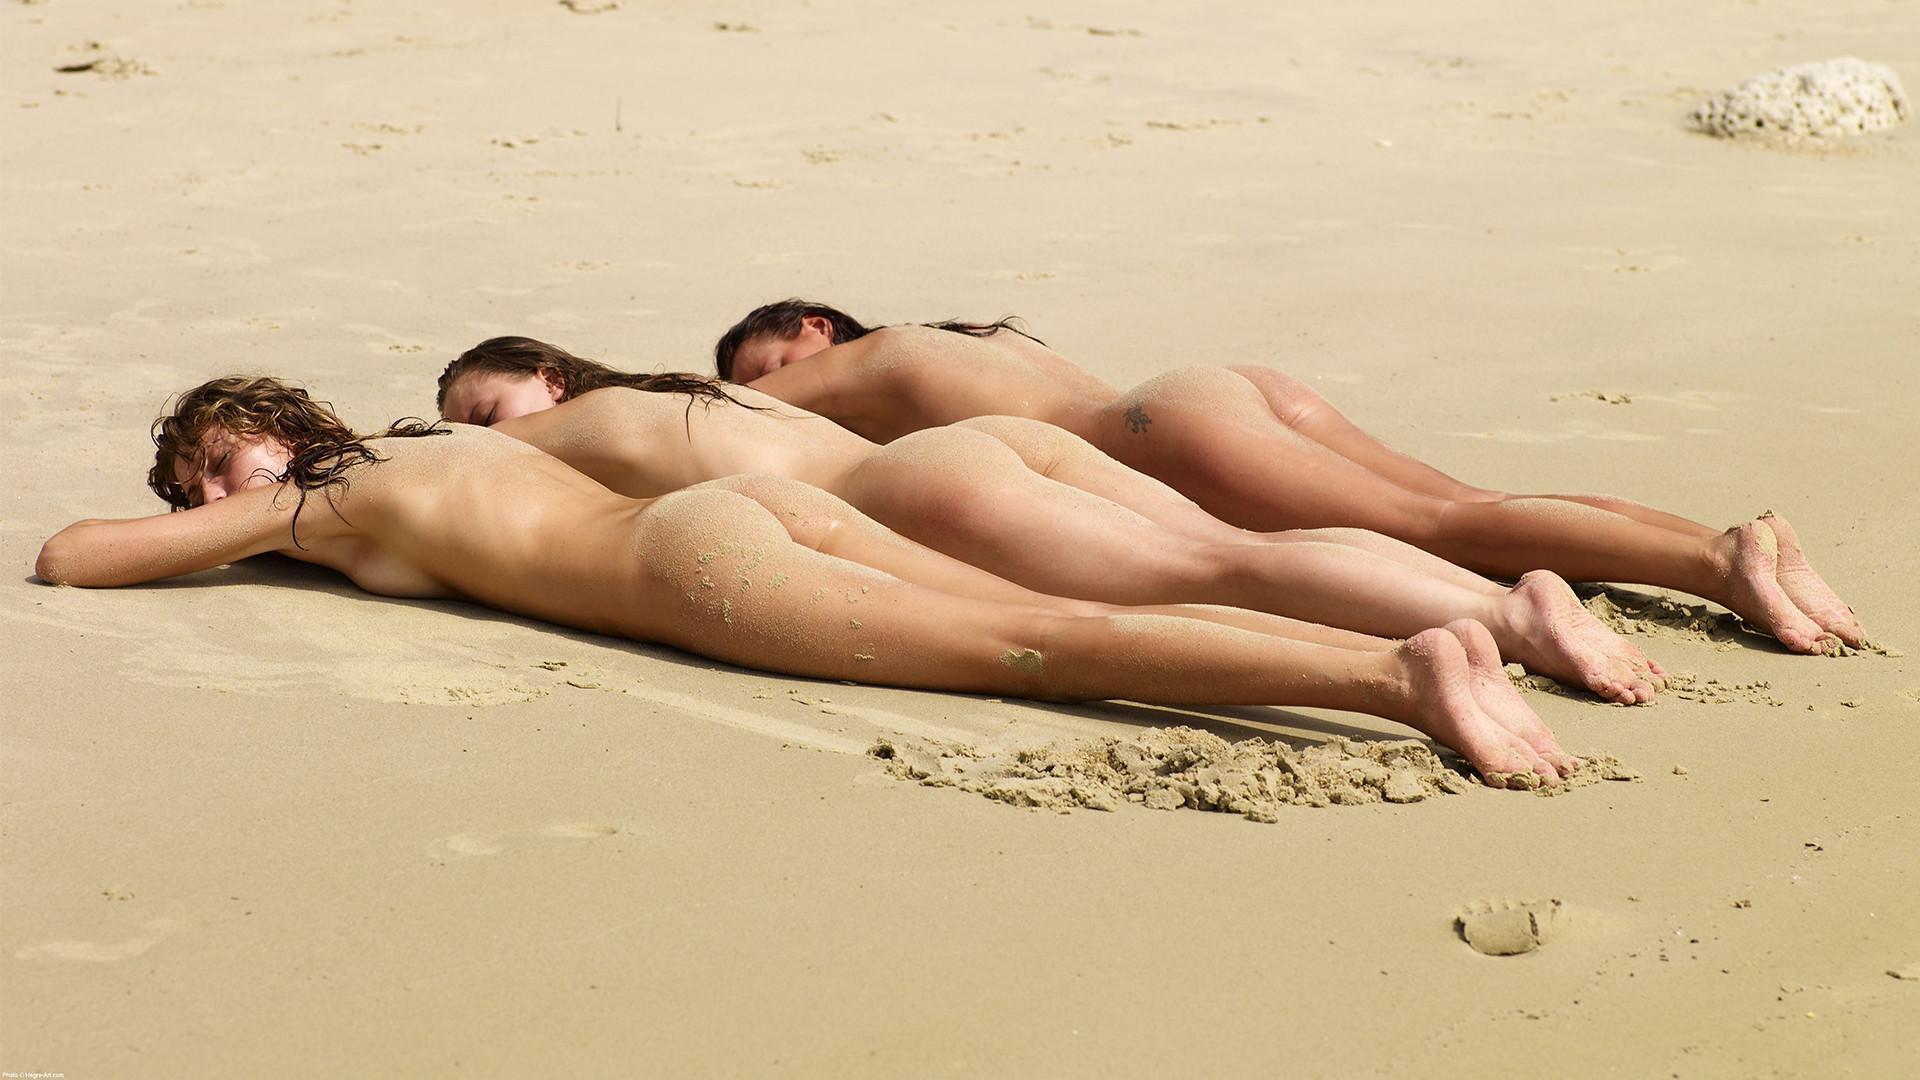 threesome-naked-girls-lesbians-mix-vol2-05